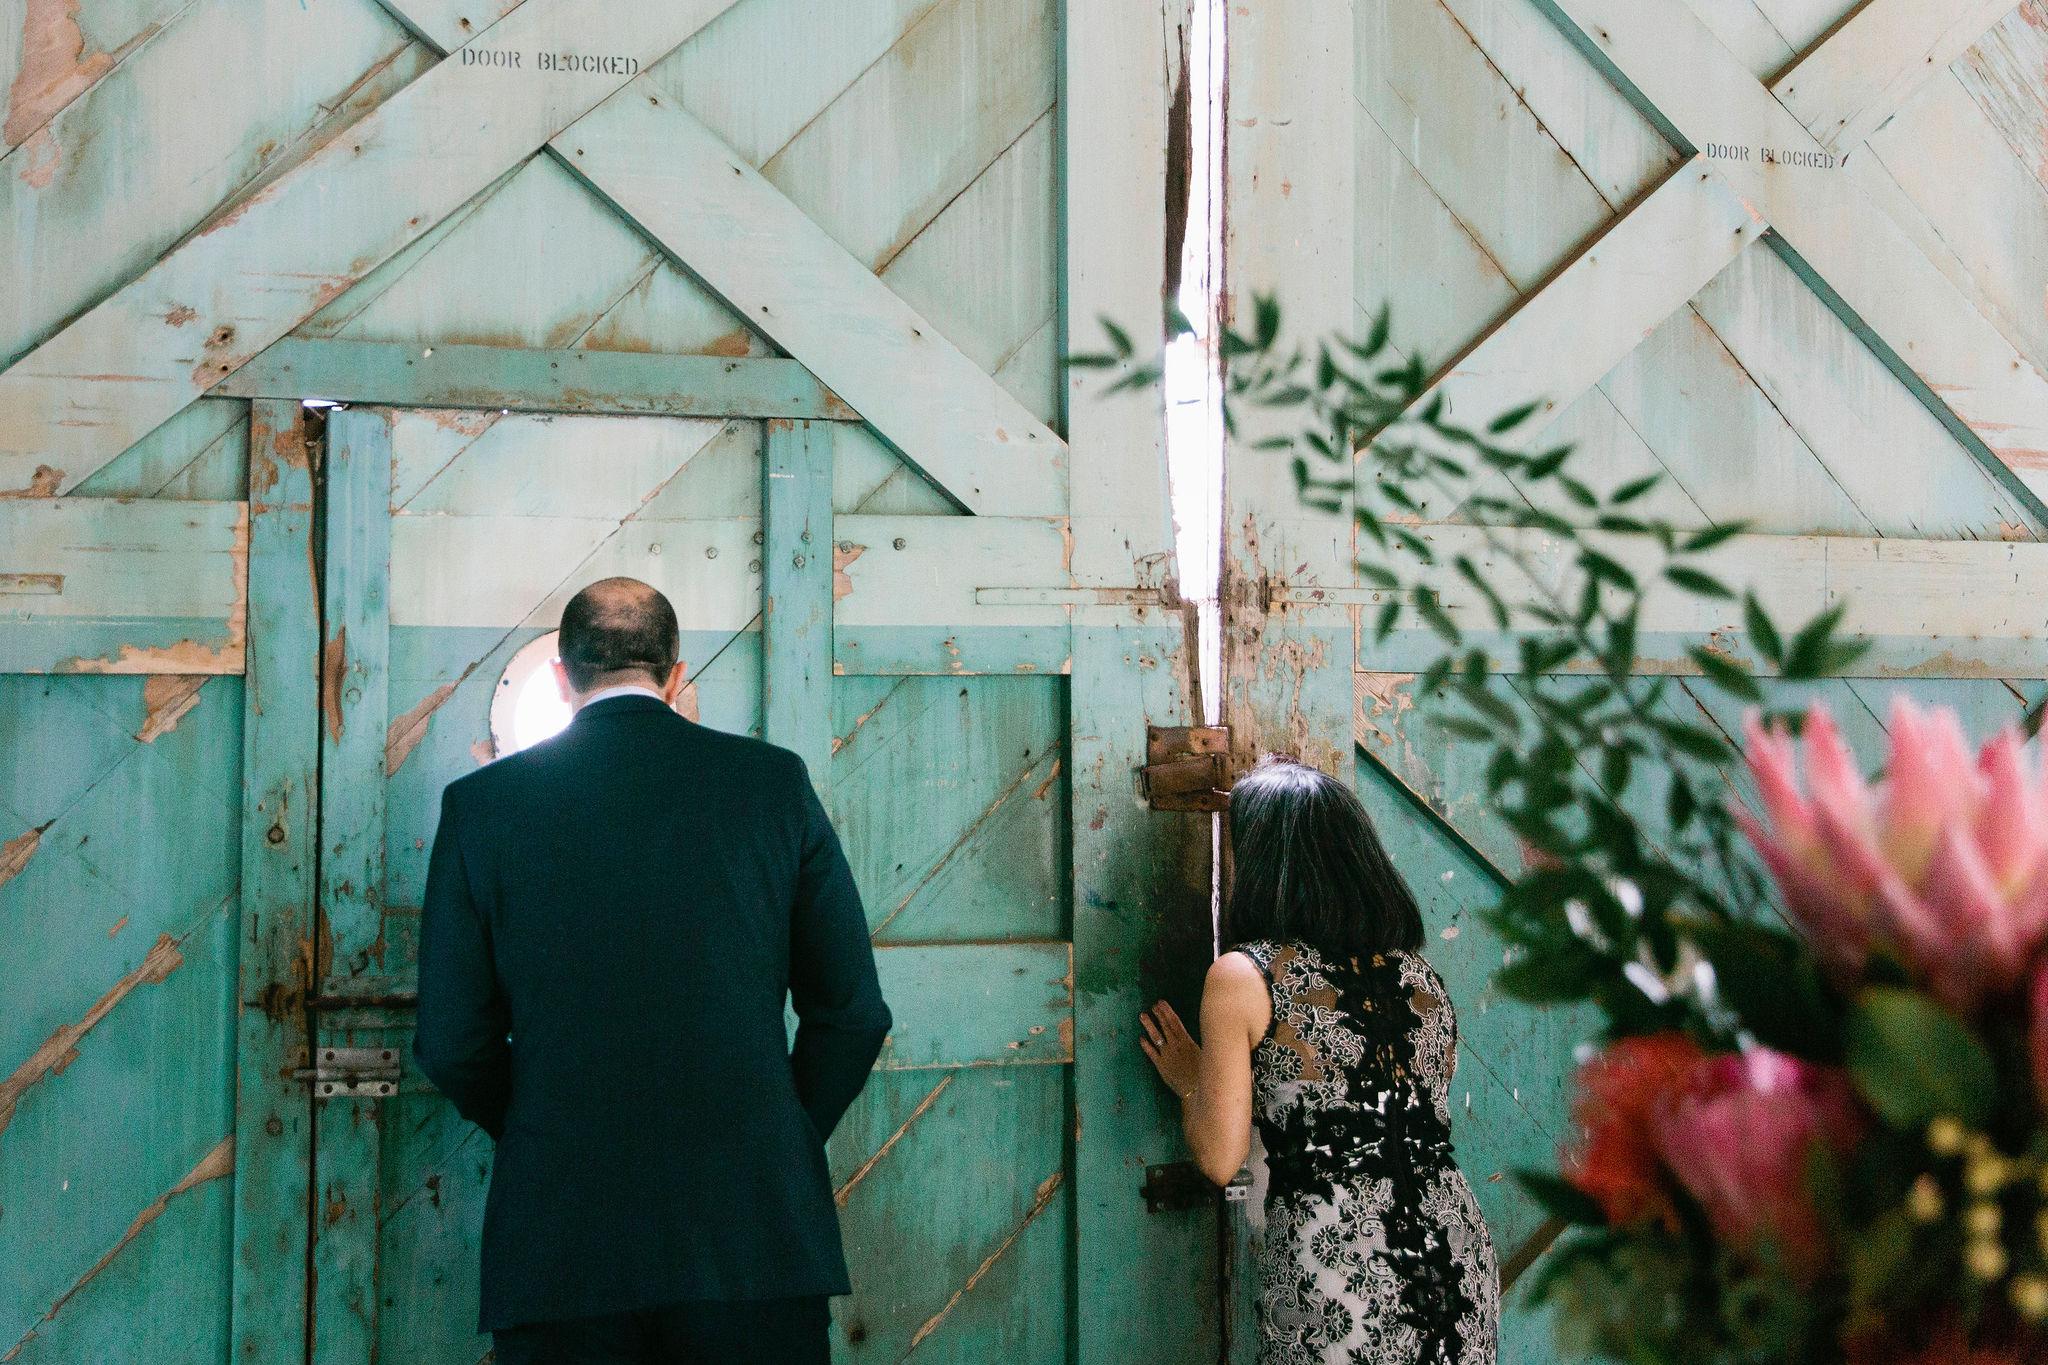 Presidio-Yacht-Club-Wedding-031.JPG